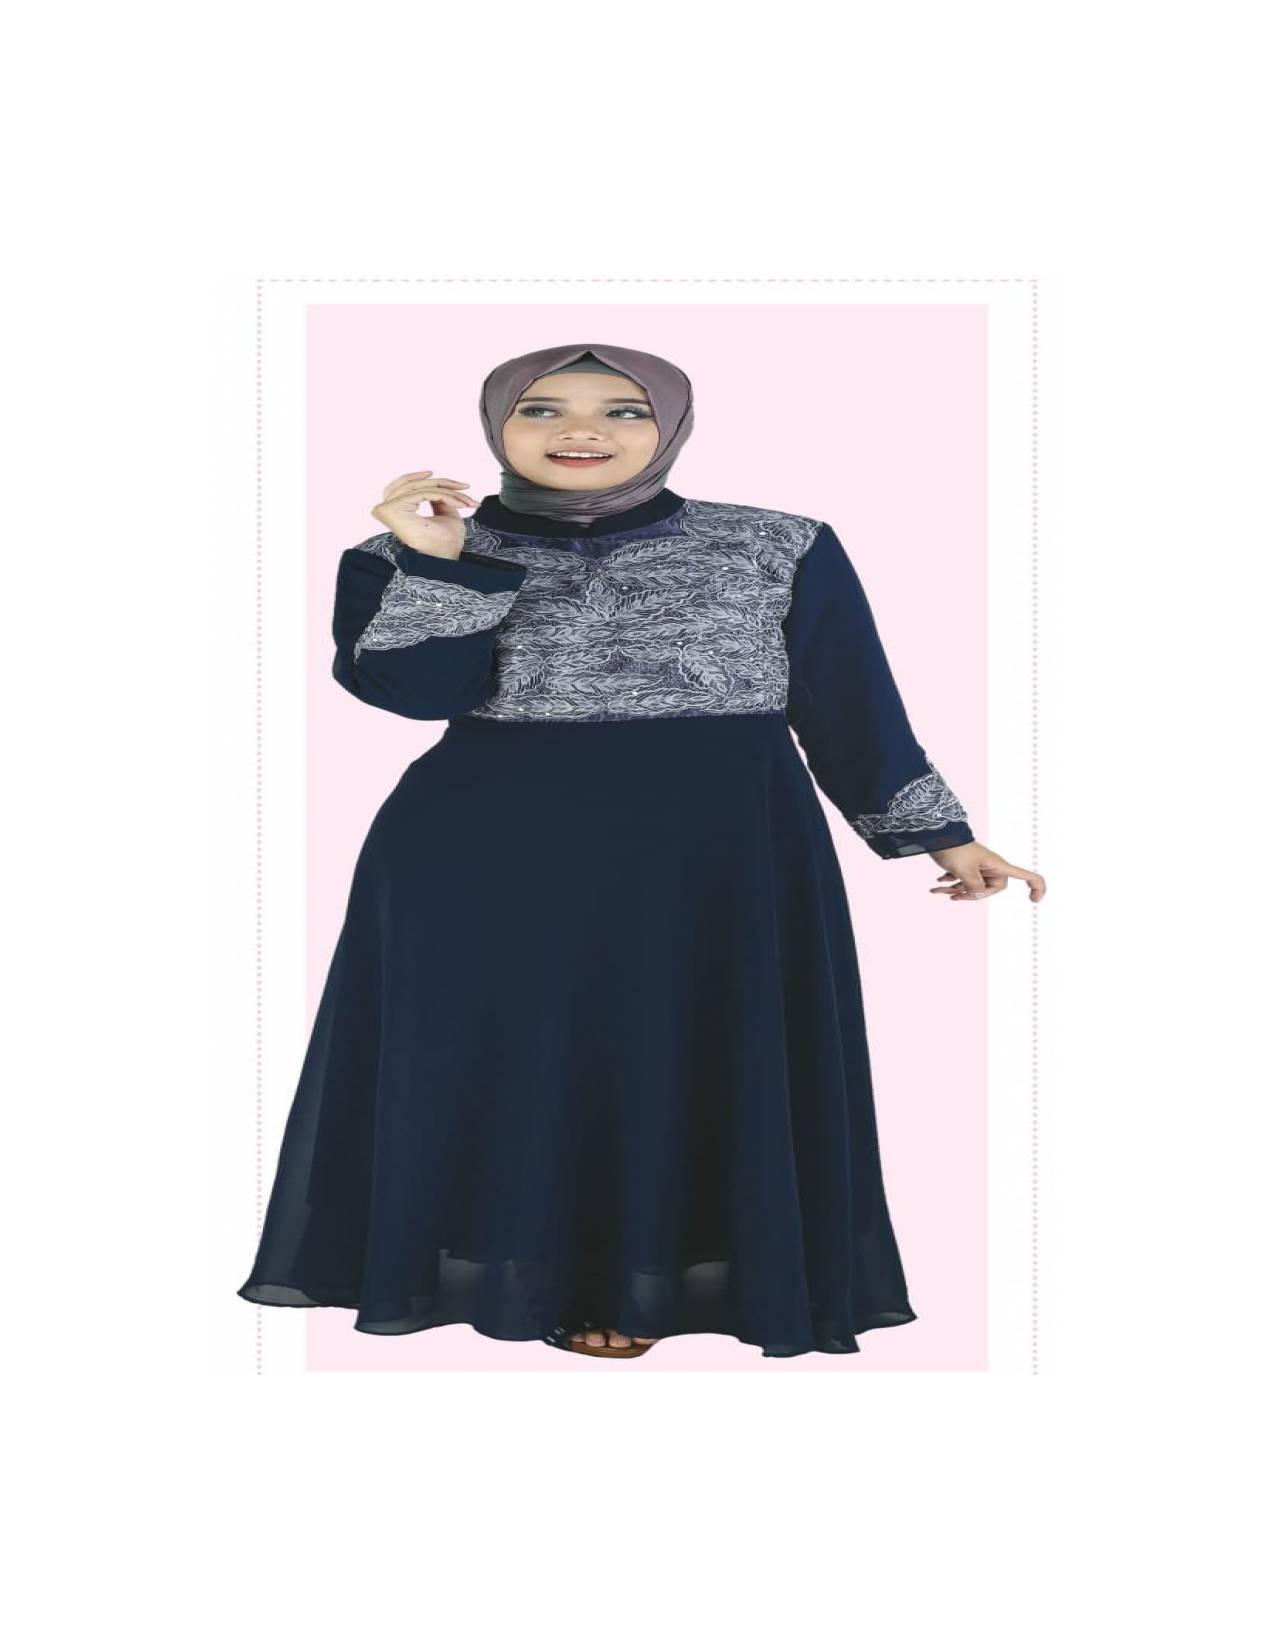 Baju Muslim Koko Pakistan Gamis Dress Casual Wanita Pria Anak BiruNavy